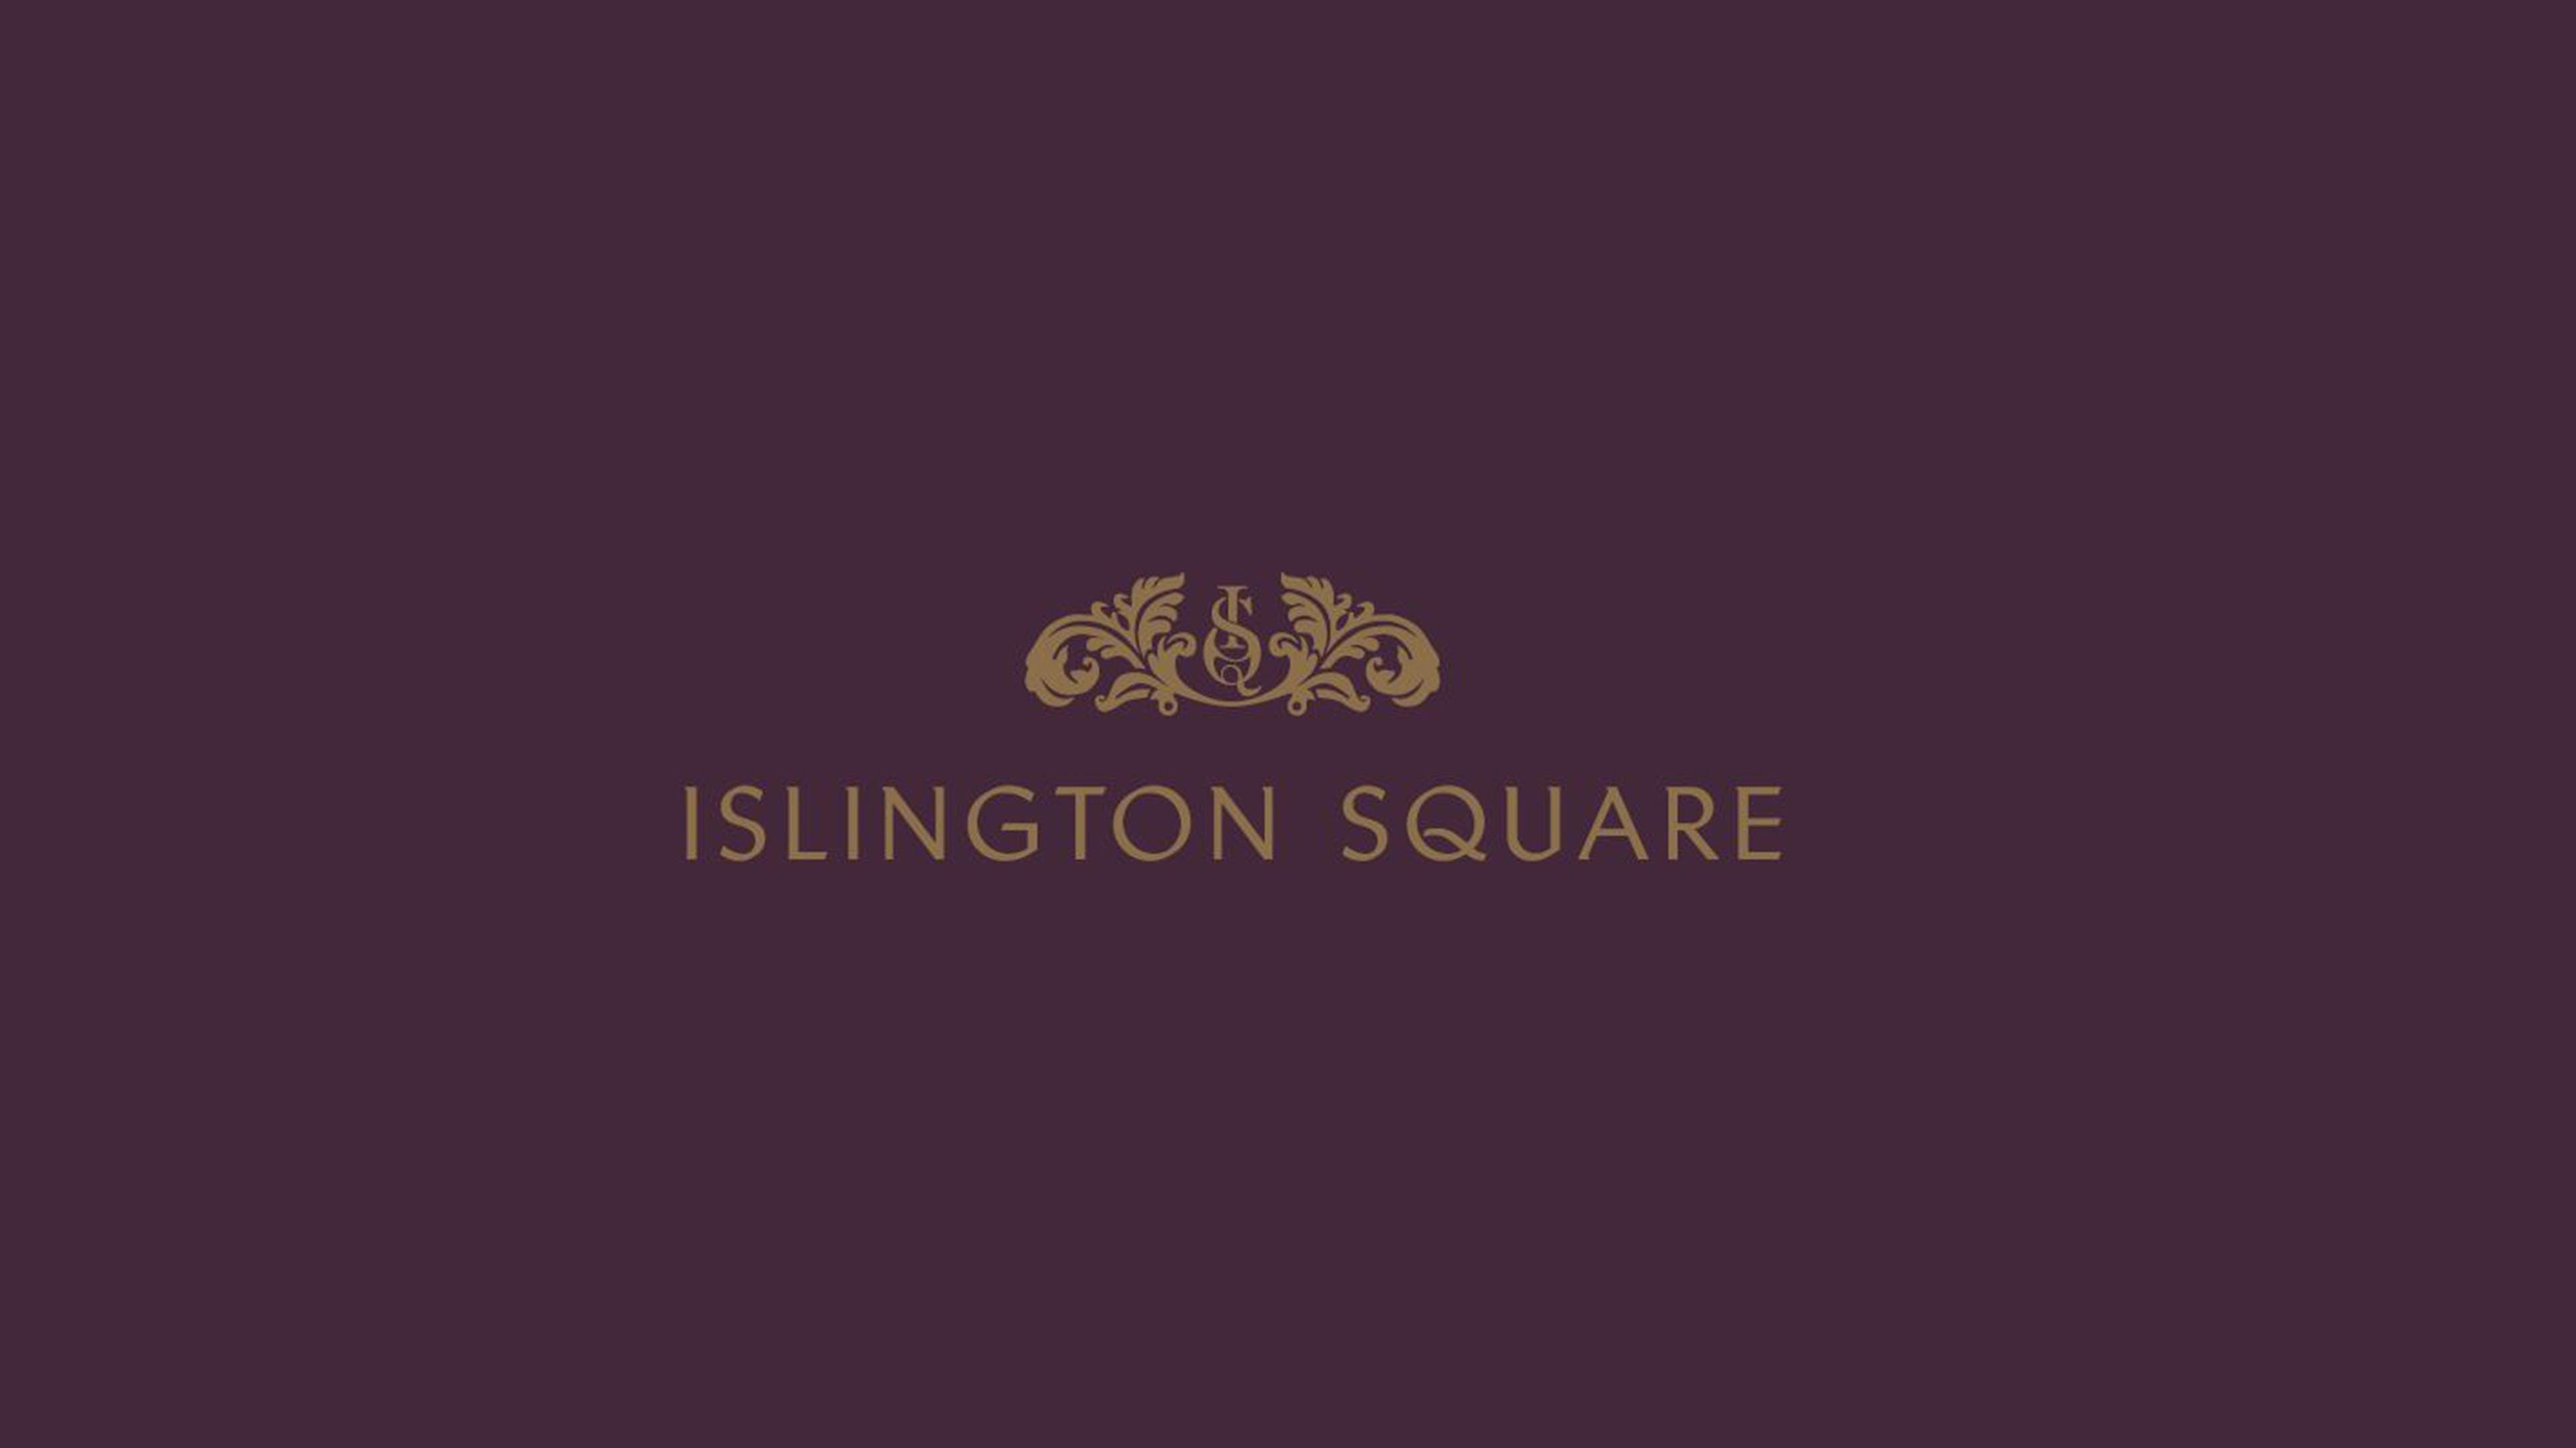 Islington Square -  - New York City Townhouse Real Estate